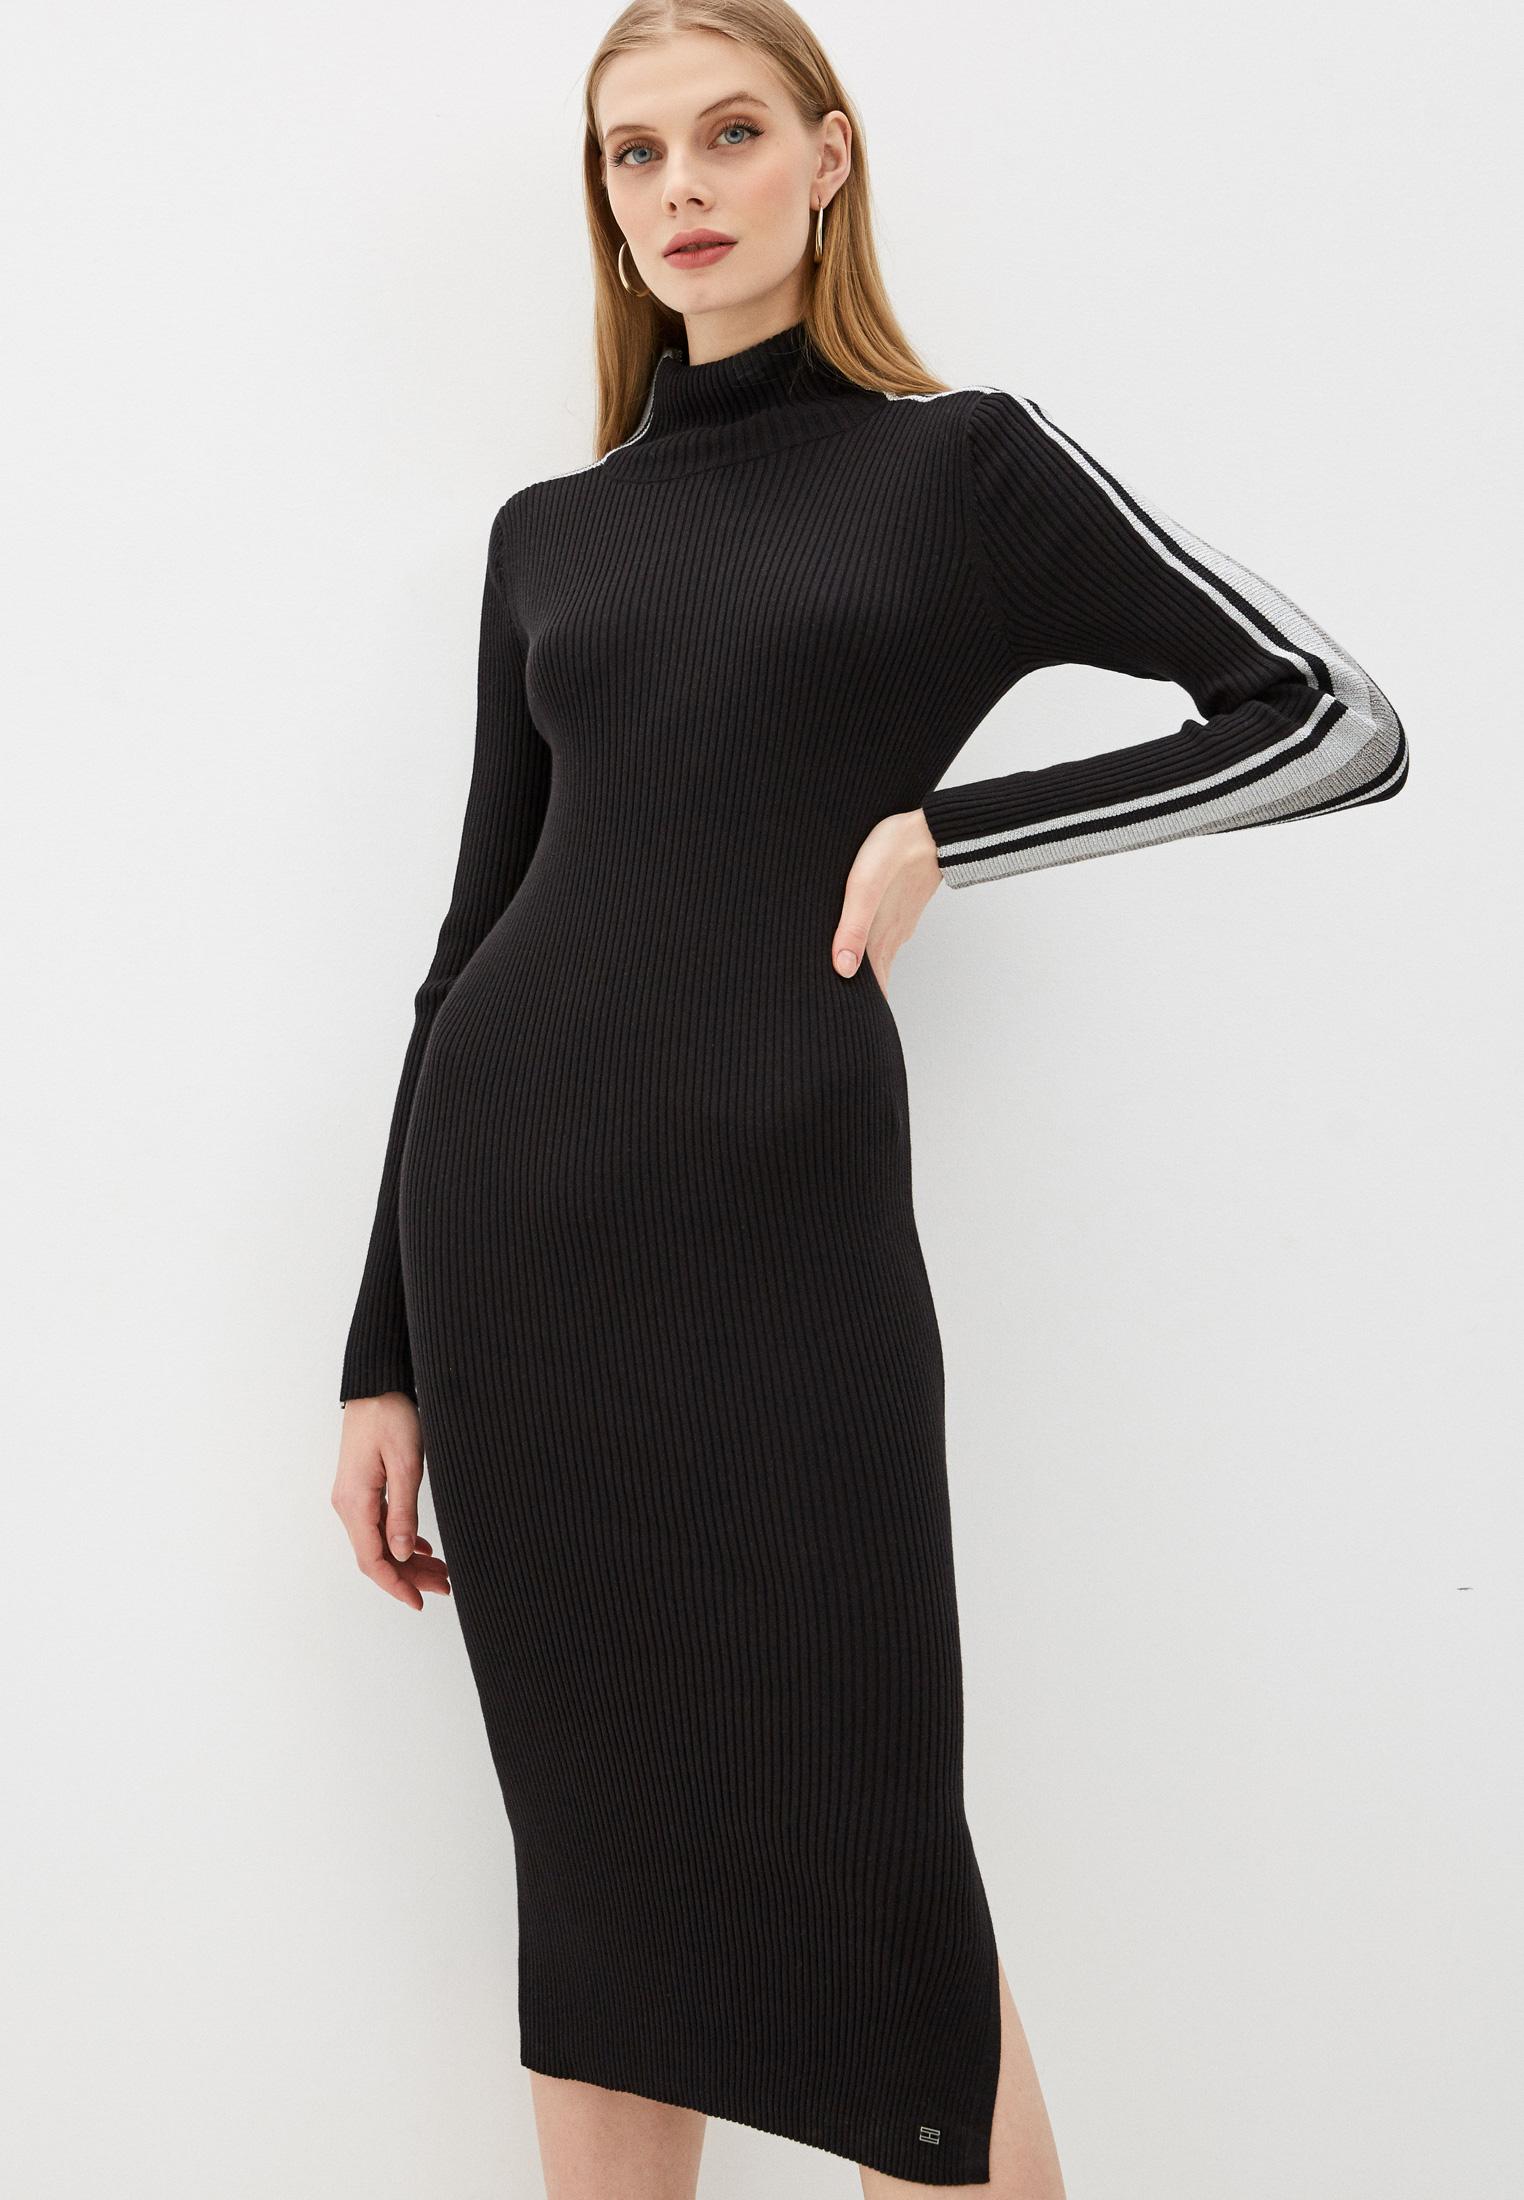 Вязаное платье Tommy Hilfiger (Томми Хилфигер) WW0WW26520